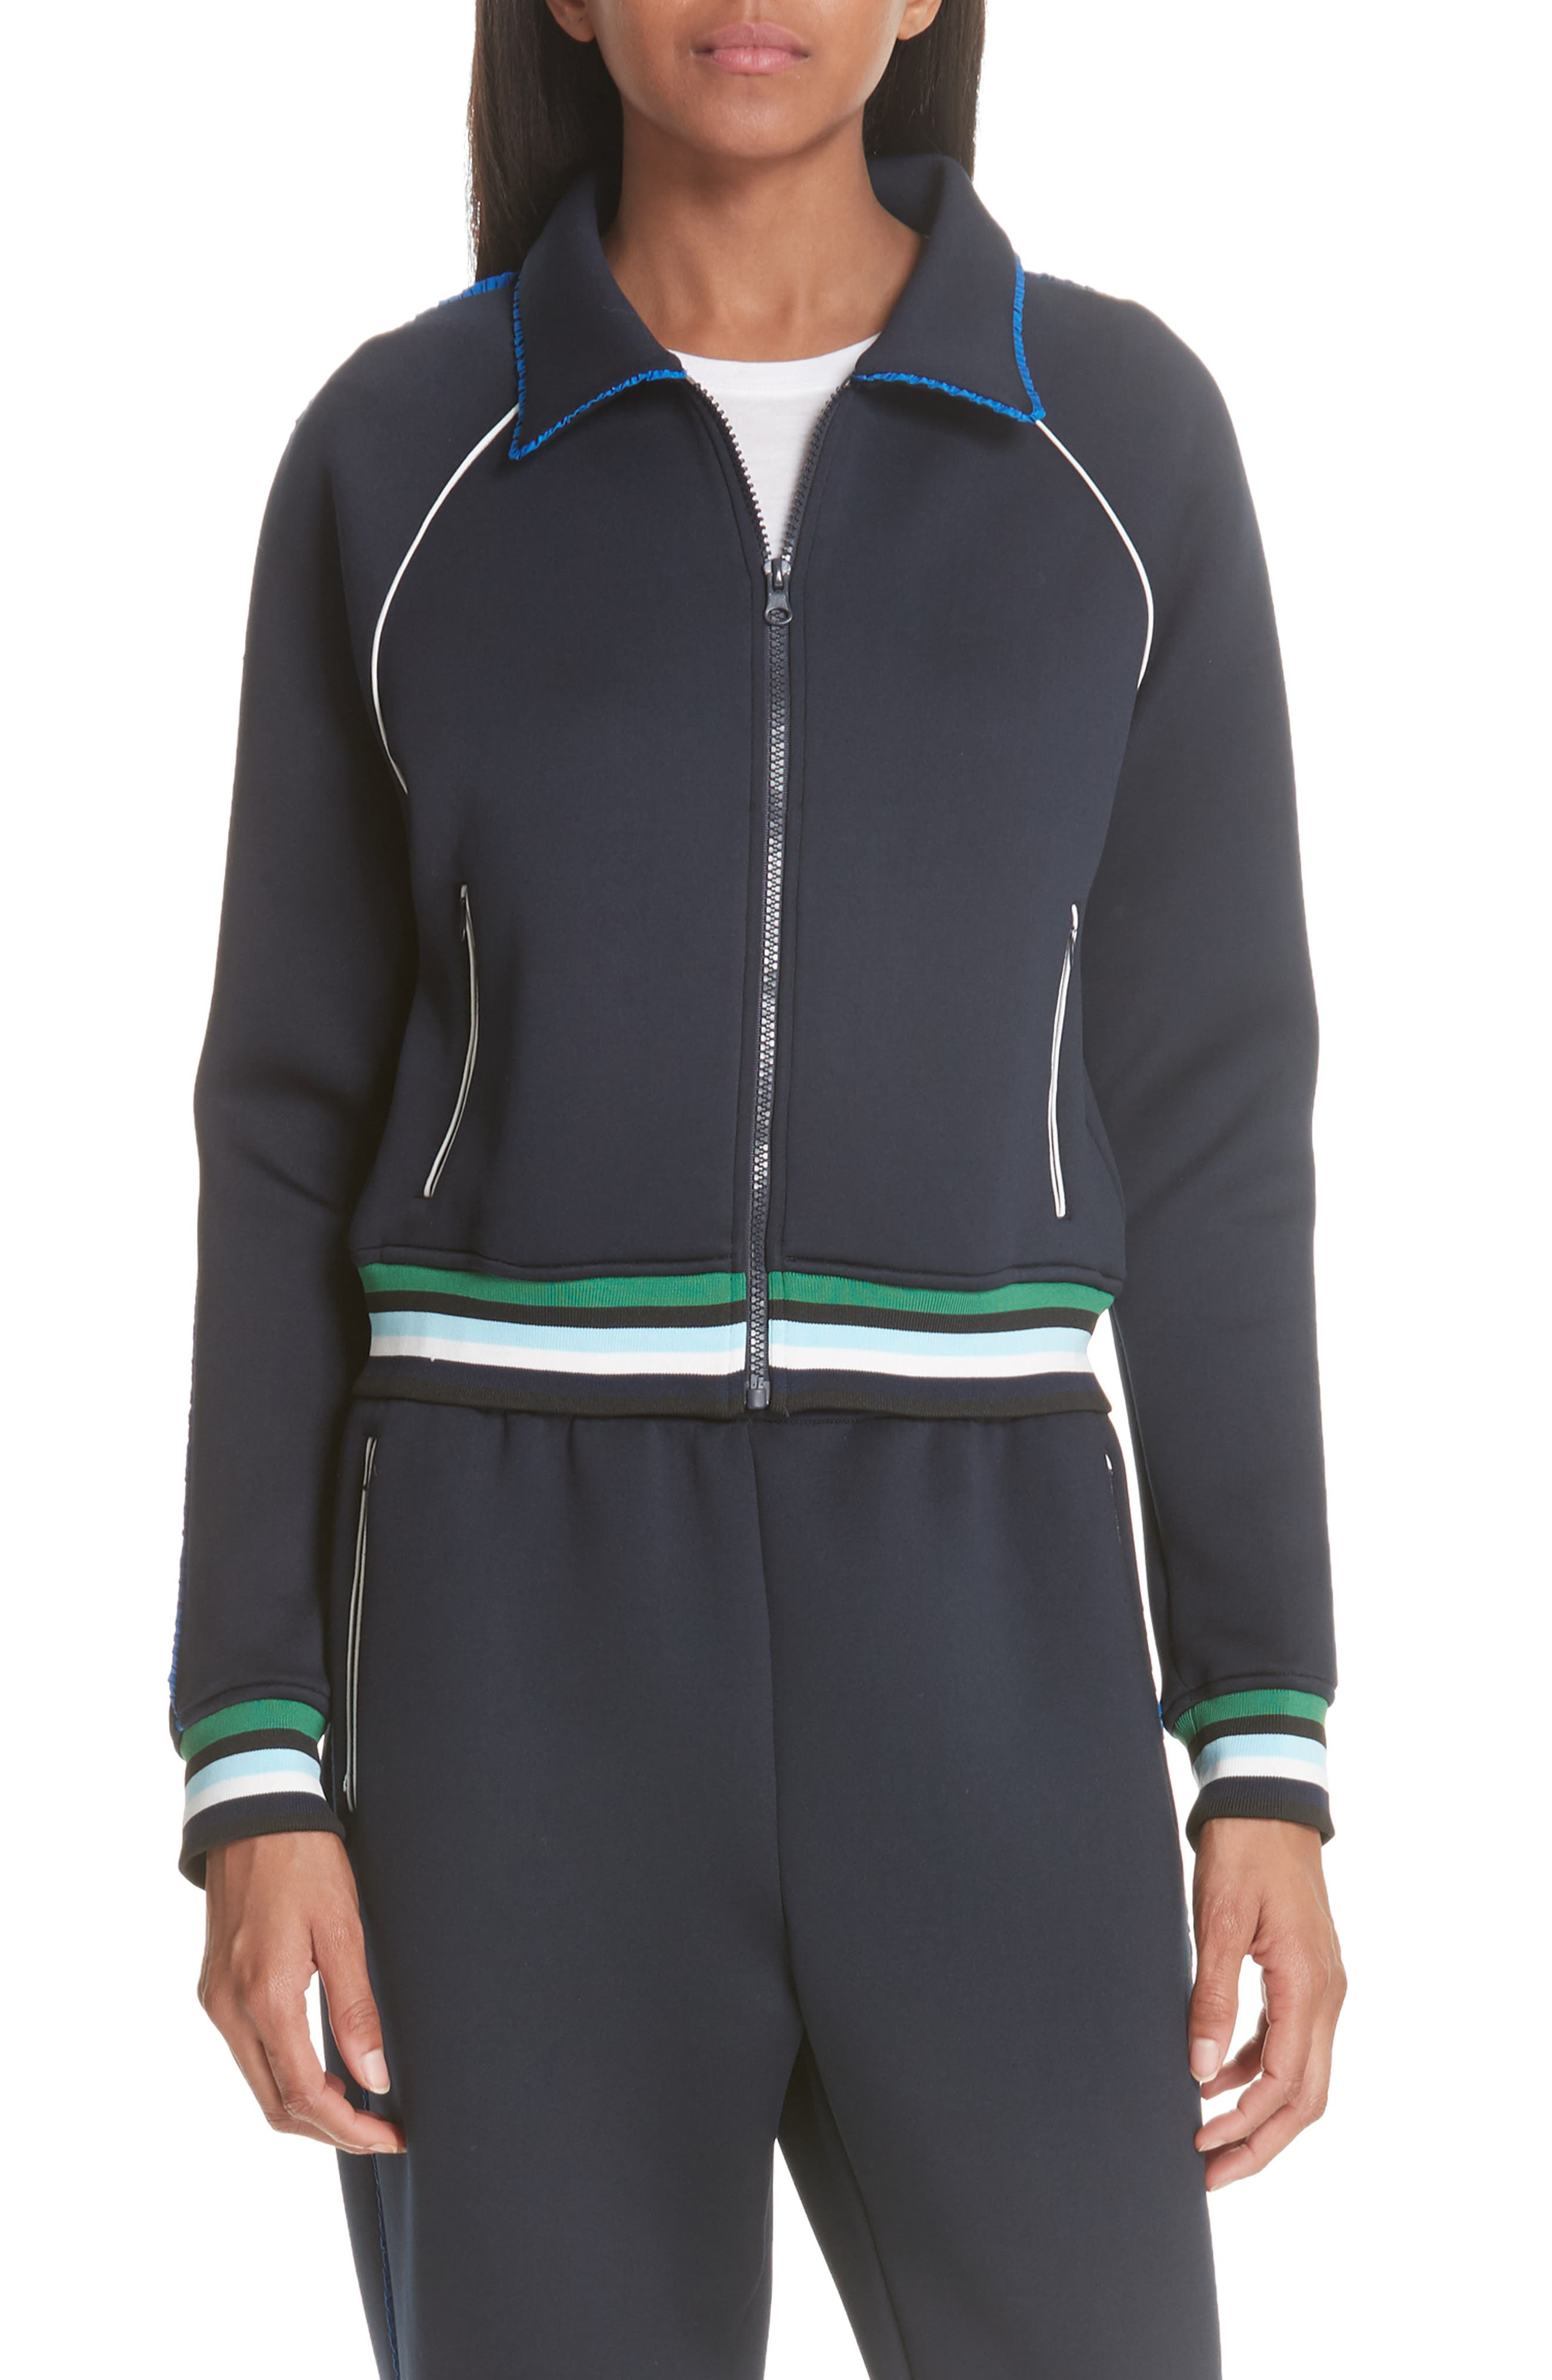 Spongy Track Jacket,                         Main,                         color, PERSIAN BLUE